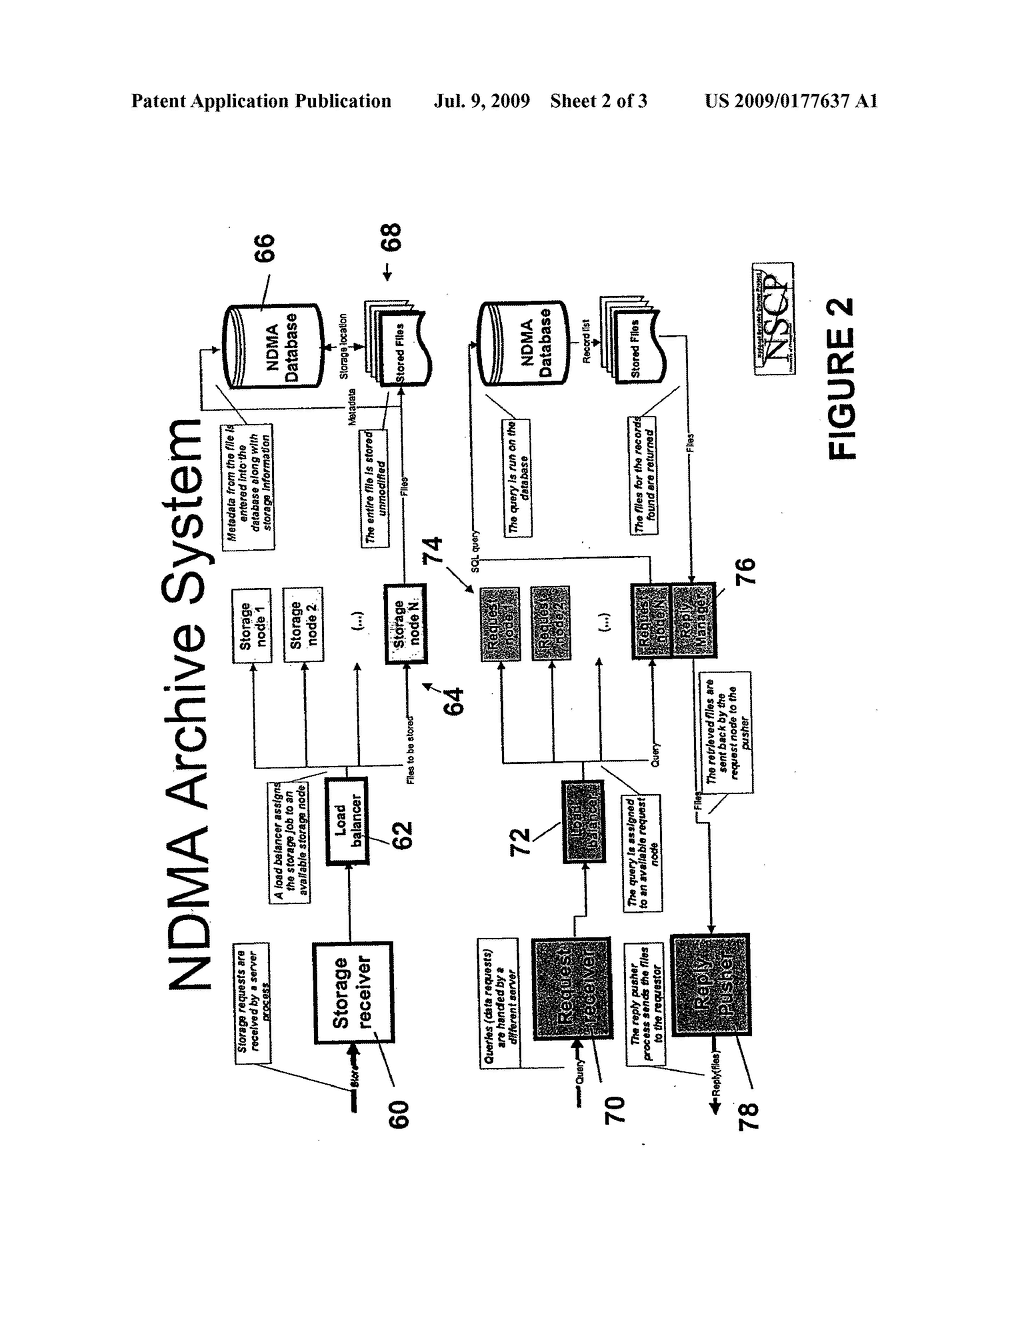 ndma db schema, dicom to relational schema translation, and xml to sql  query translation - diagram, schematic, and image 03